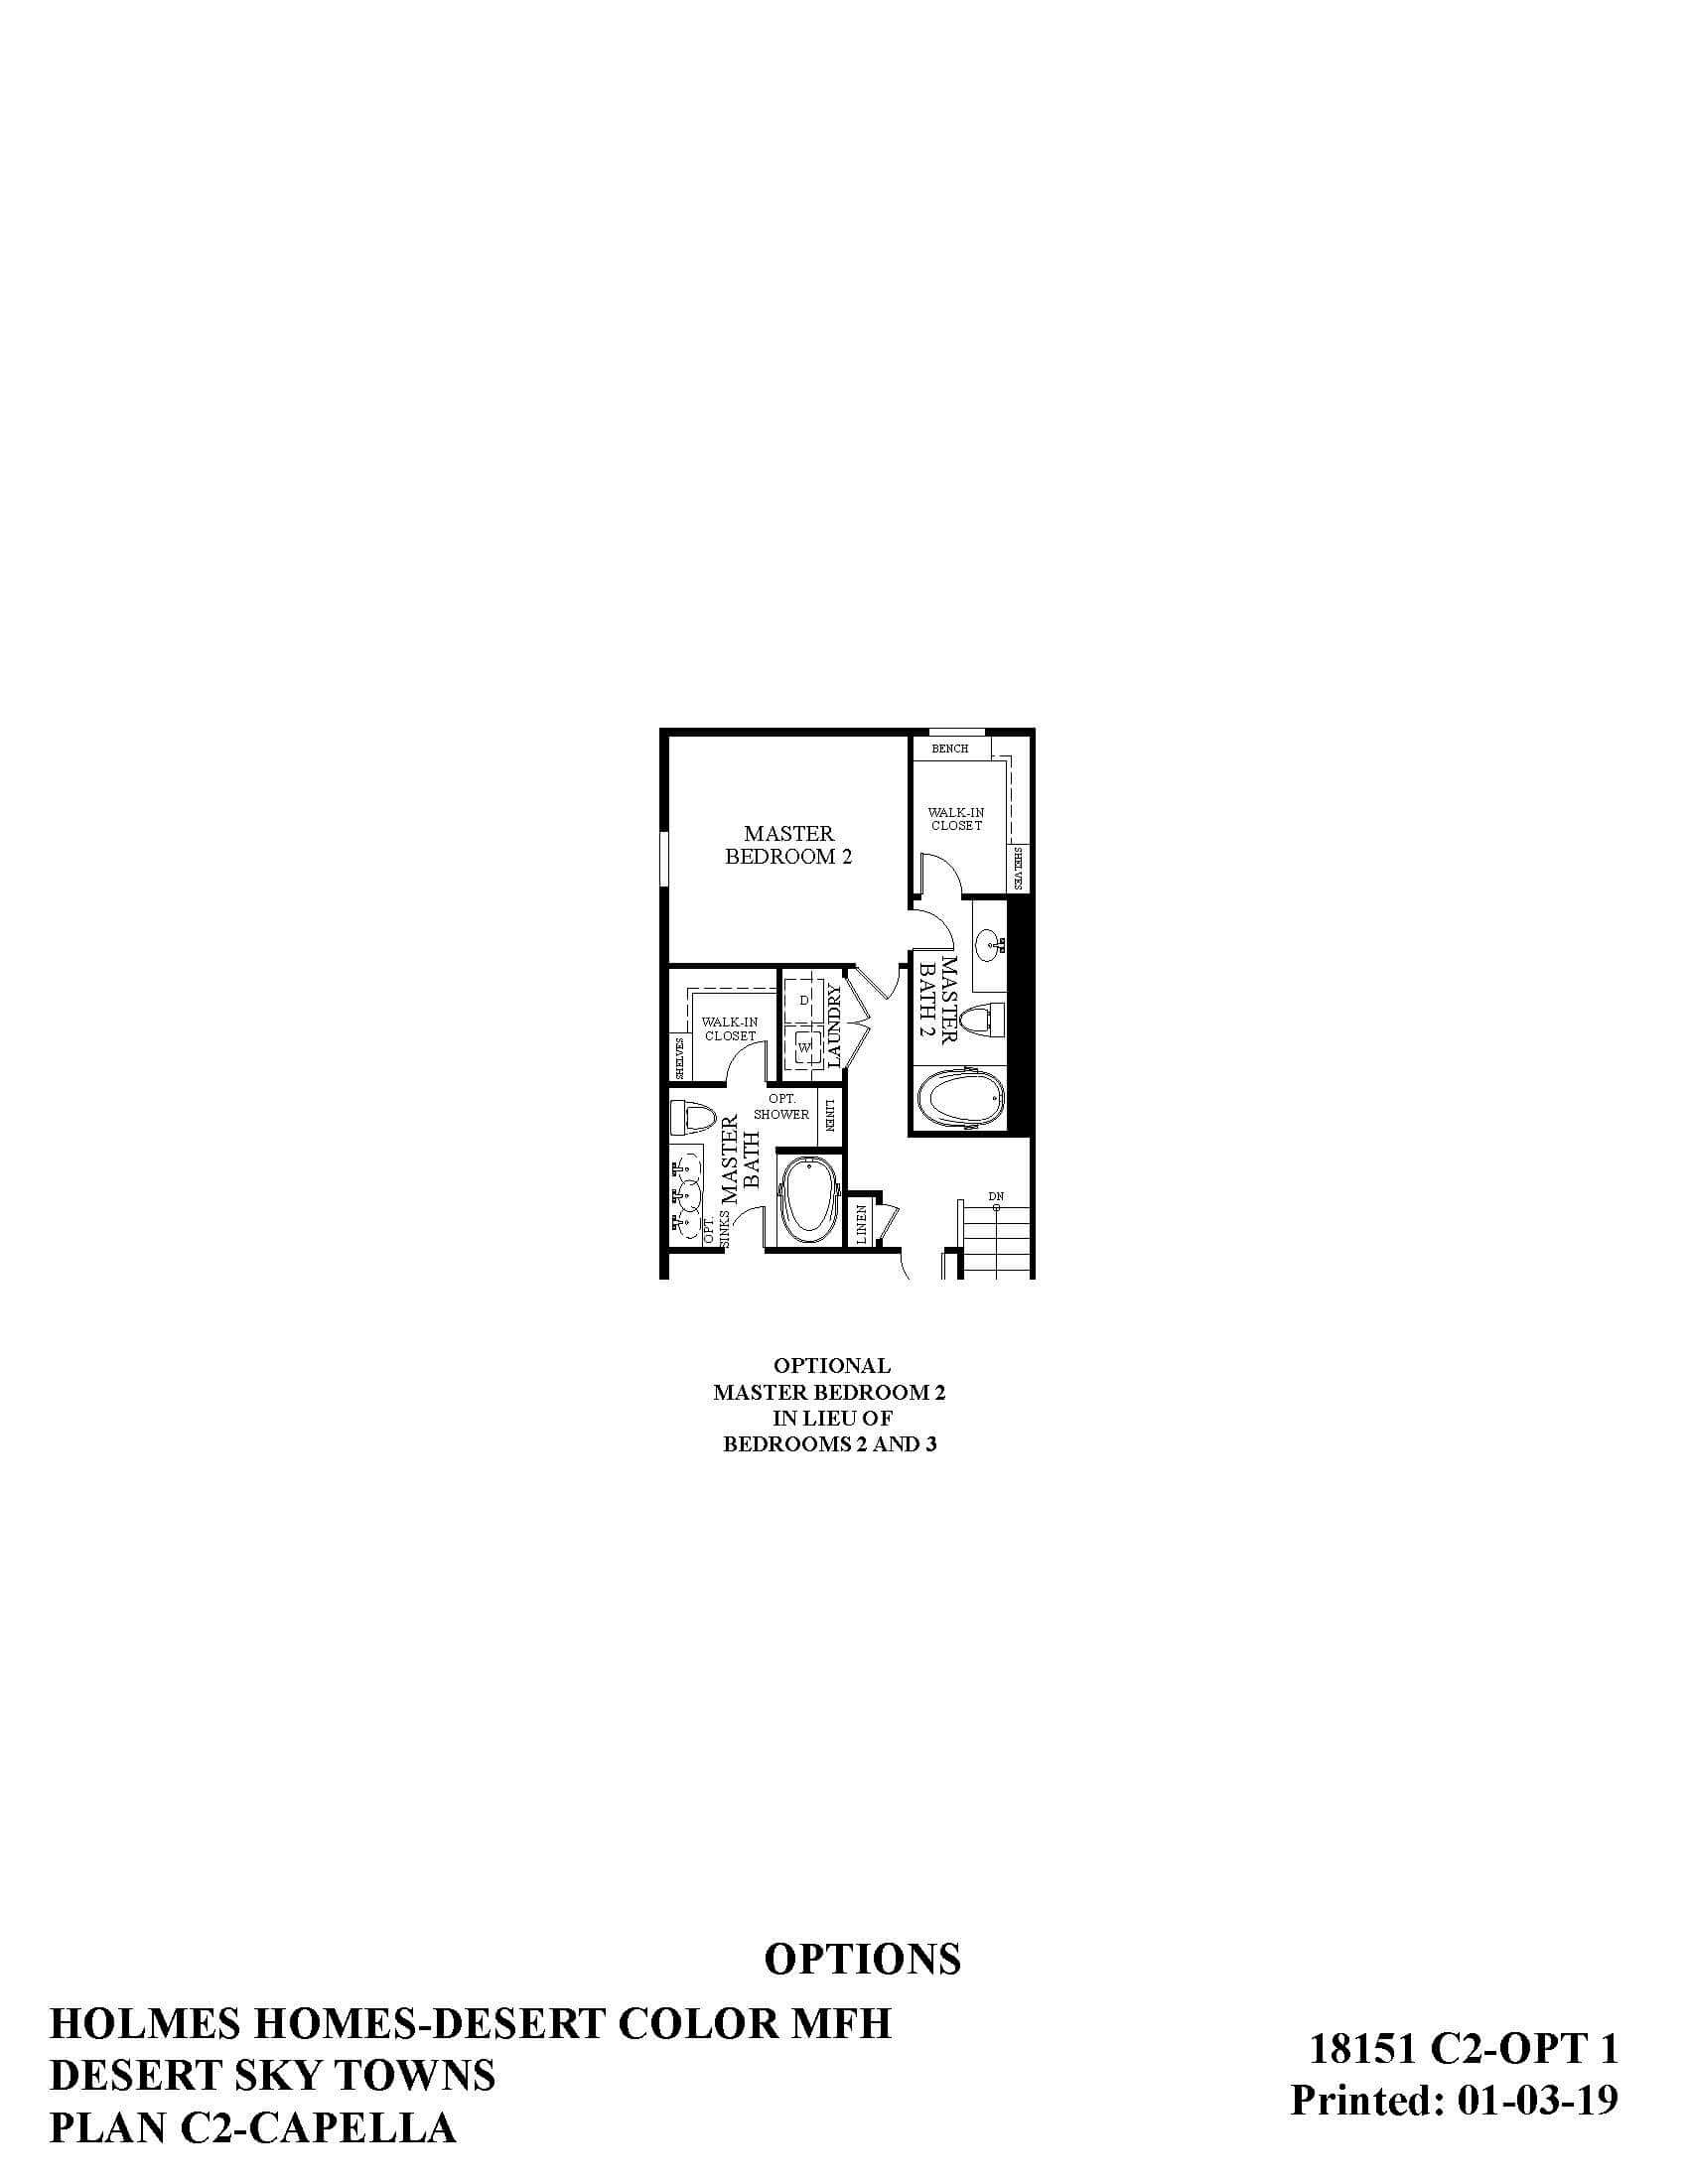 Desert Color Holmes Homes Desert Sky Capella Options Floor Plan